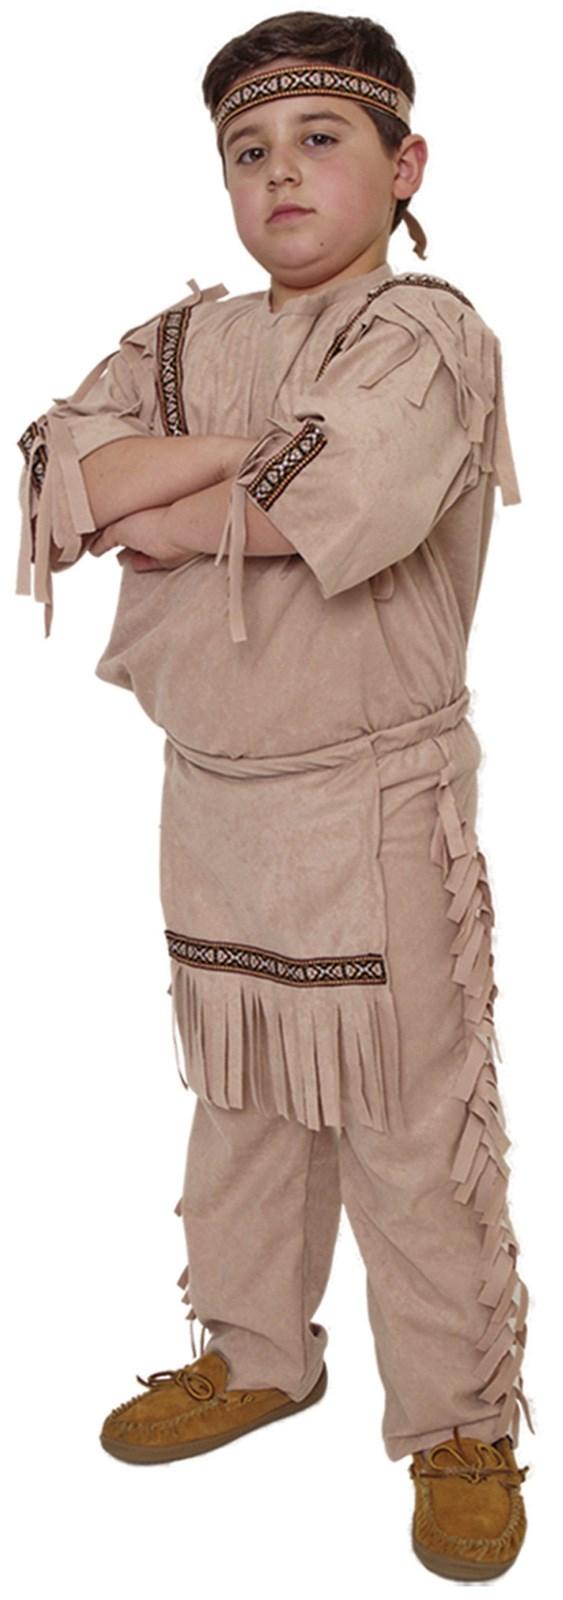 Image of Indian Boy Costume